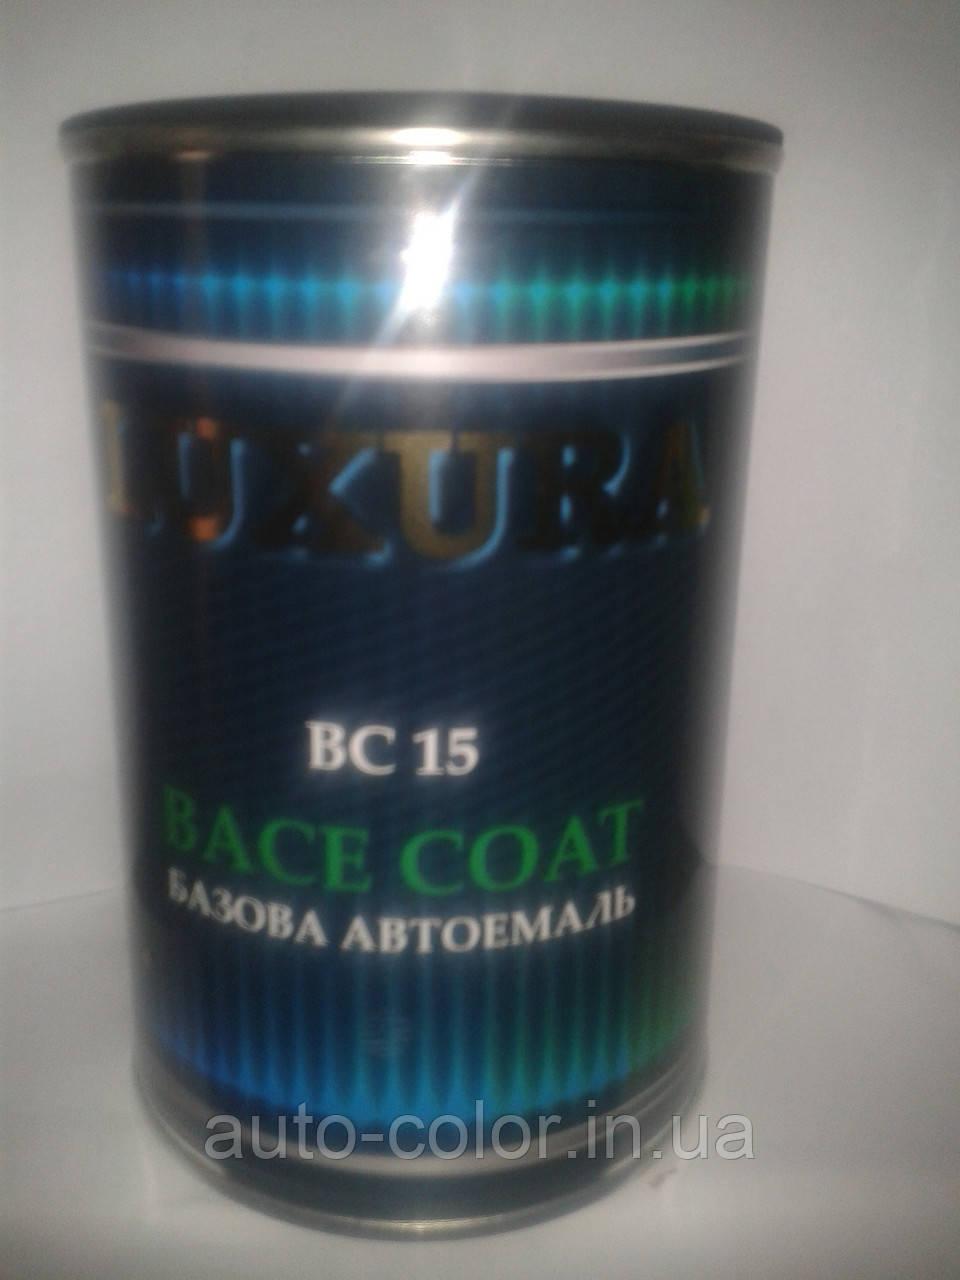 42U DAEWOO  Базовая автоэмаль Luxura 1 л